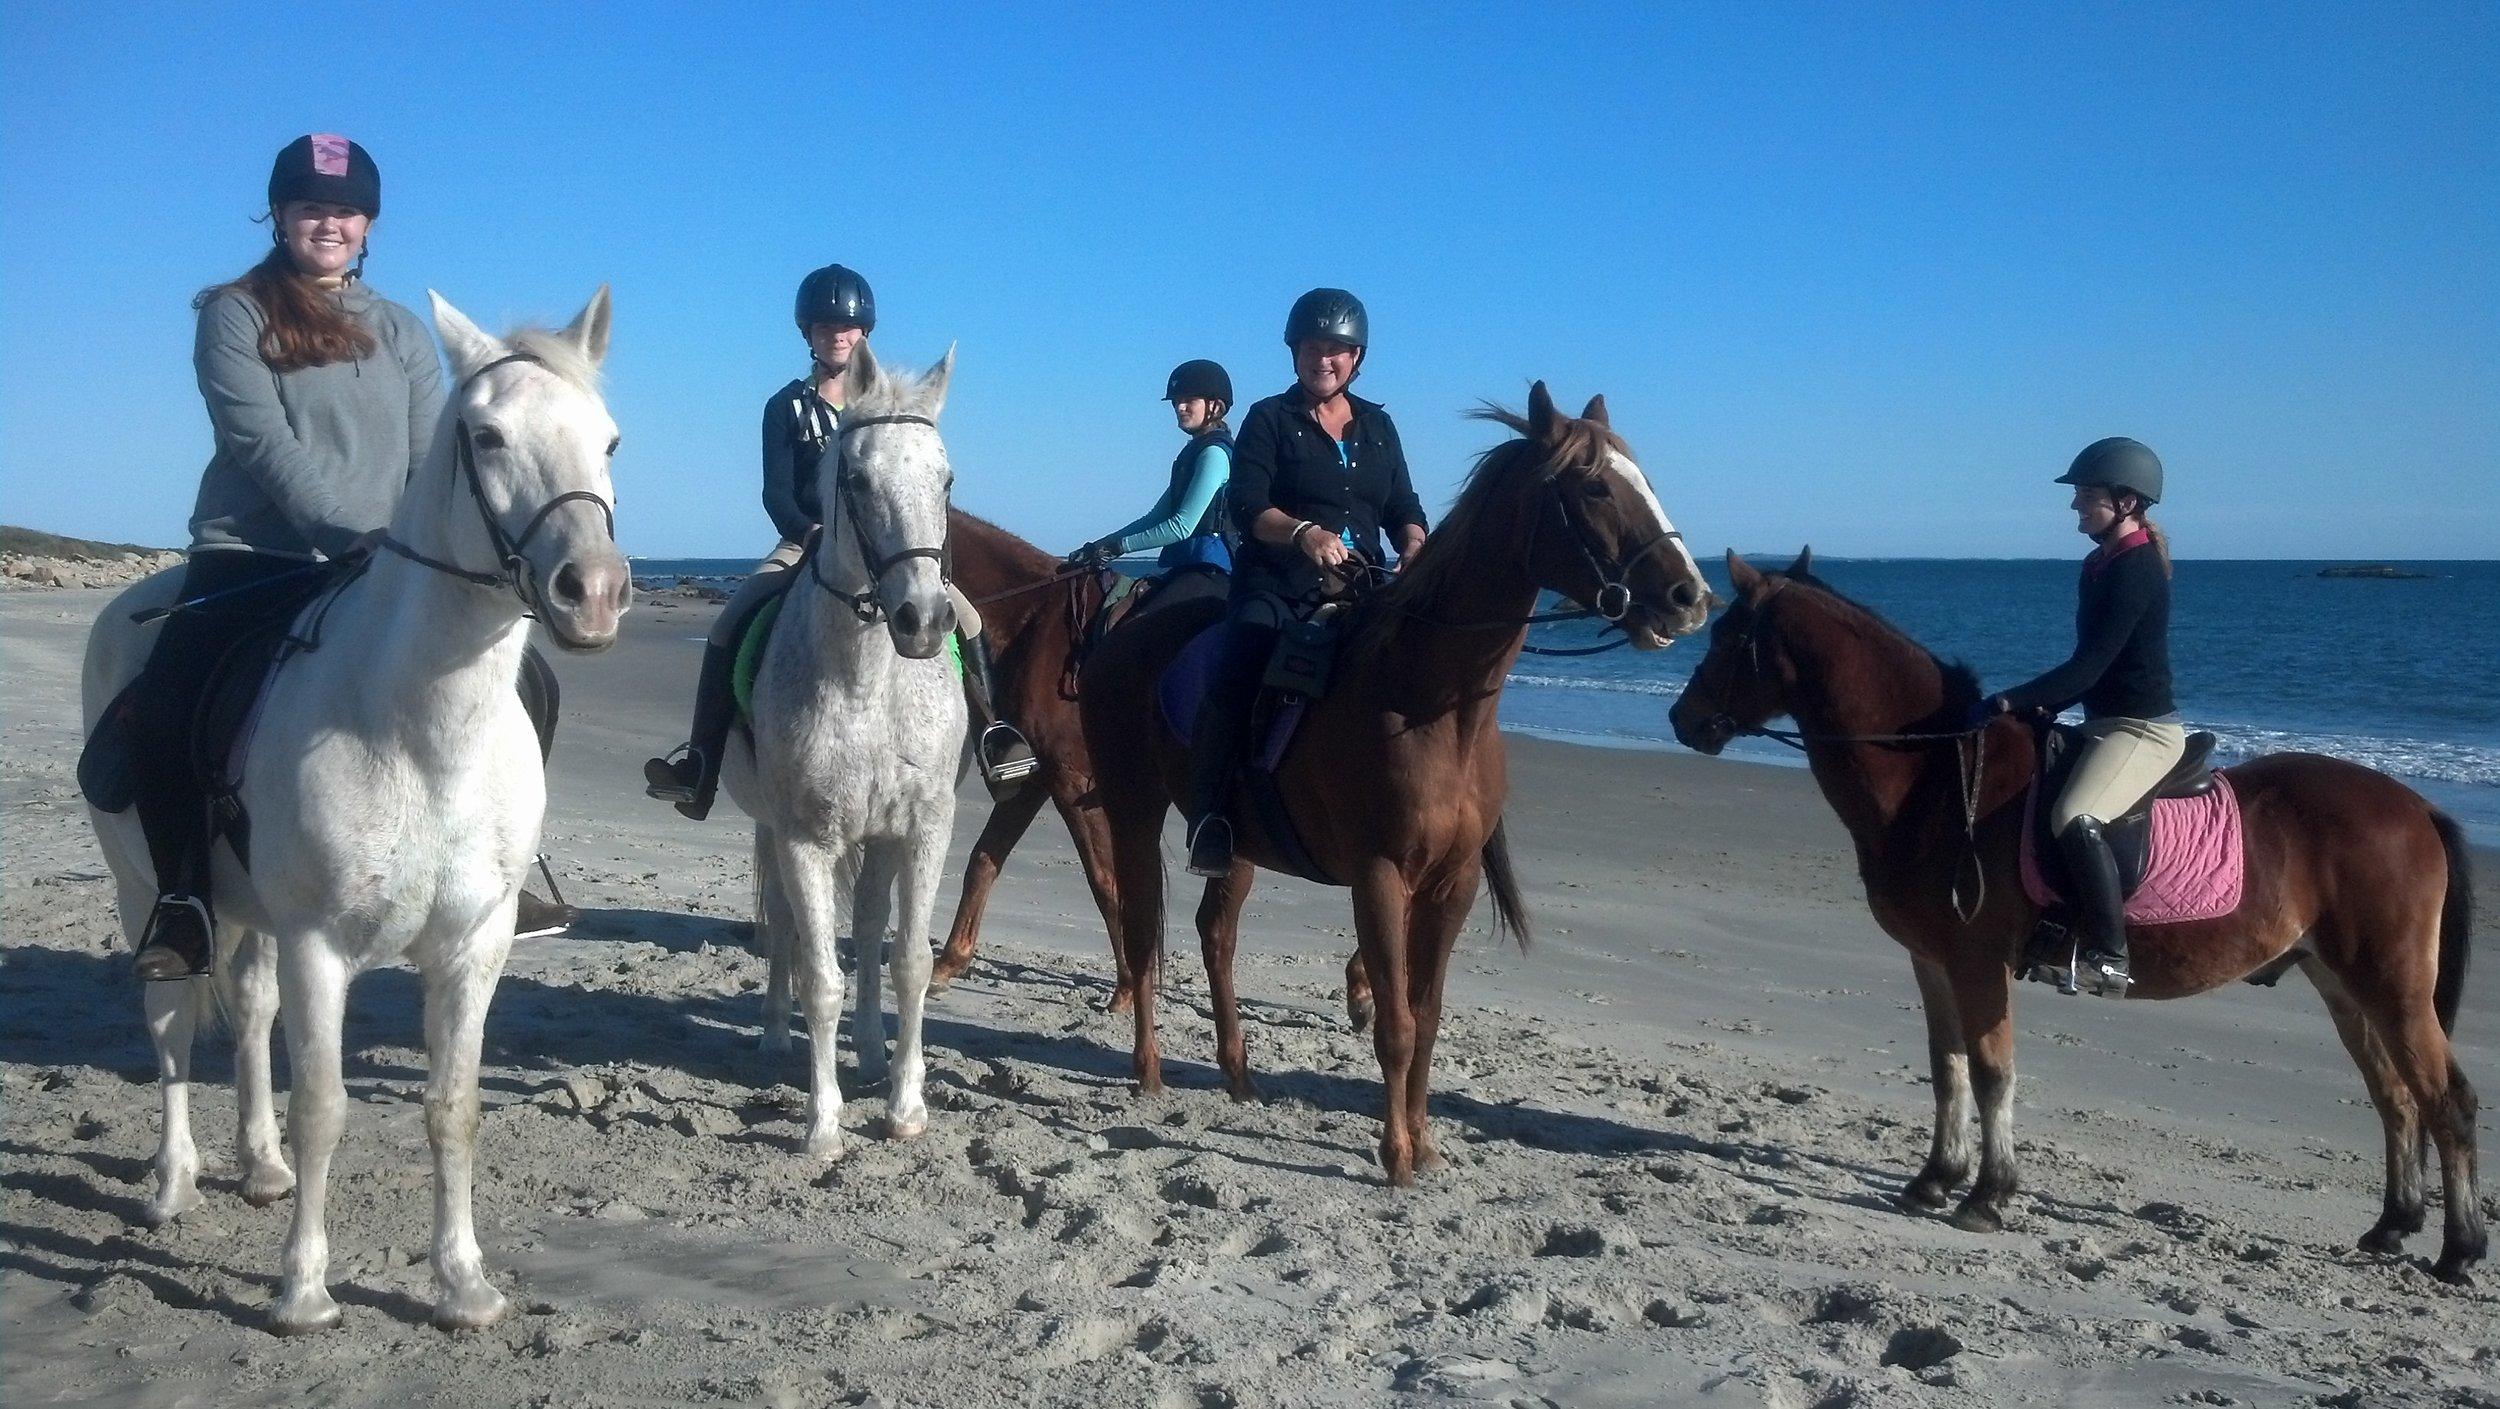 beach ride oct 2013 (18).jpg